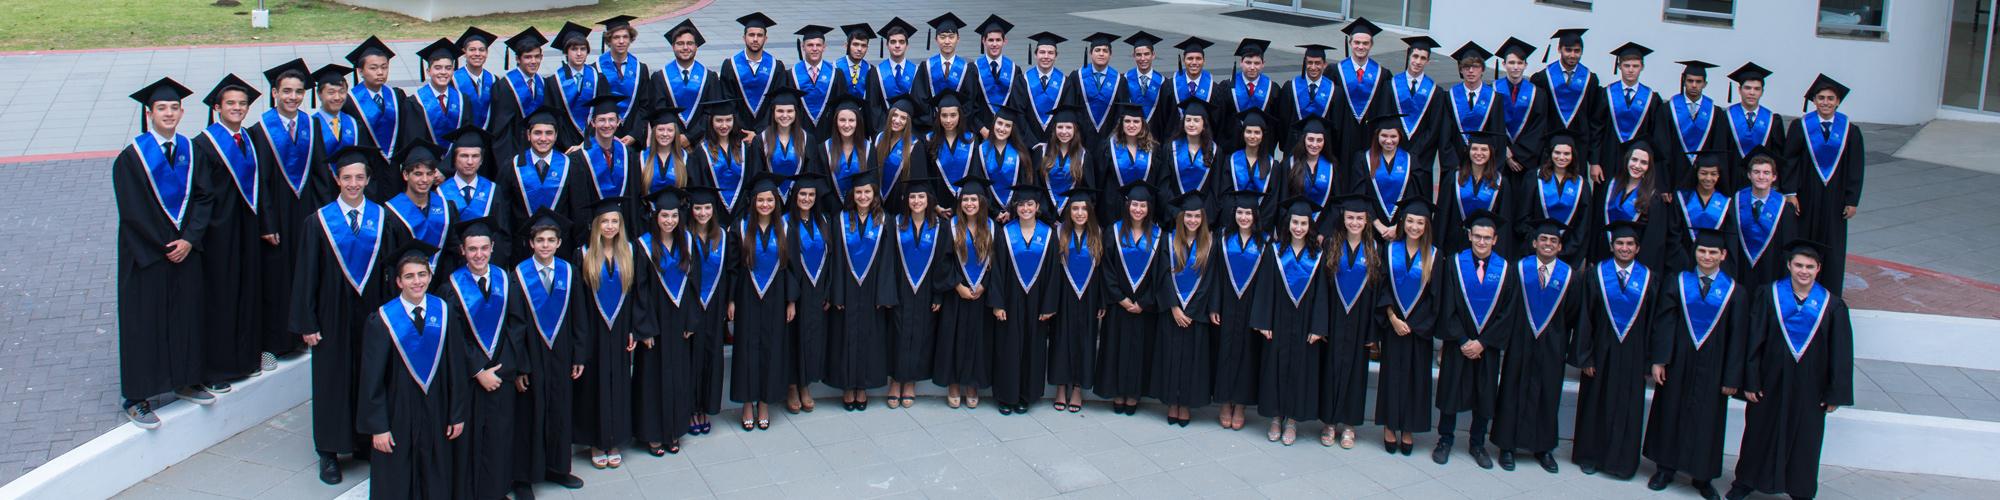 Group photo of Graduating Class